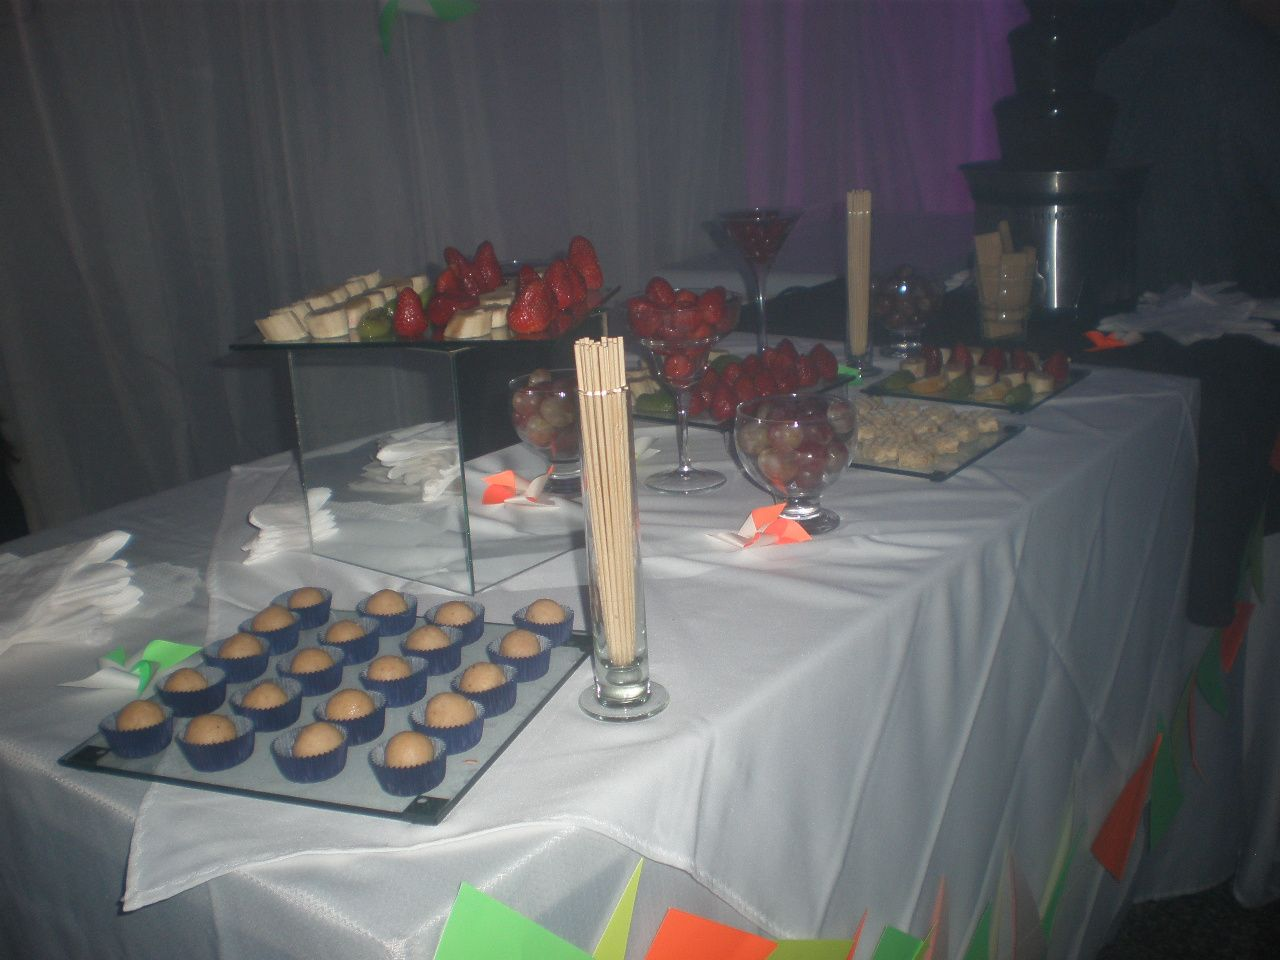 Cumpleaños con cascada dechocolate #fiesta #golosinas # #chocolates #cumpleaños infantiles # cumpleaños de adultos #mesadulce #festejo #cascadadechocolate #agasajar #mesa dulce #candybar #sweet table